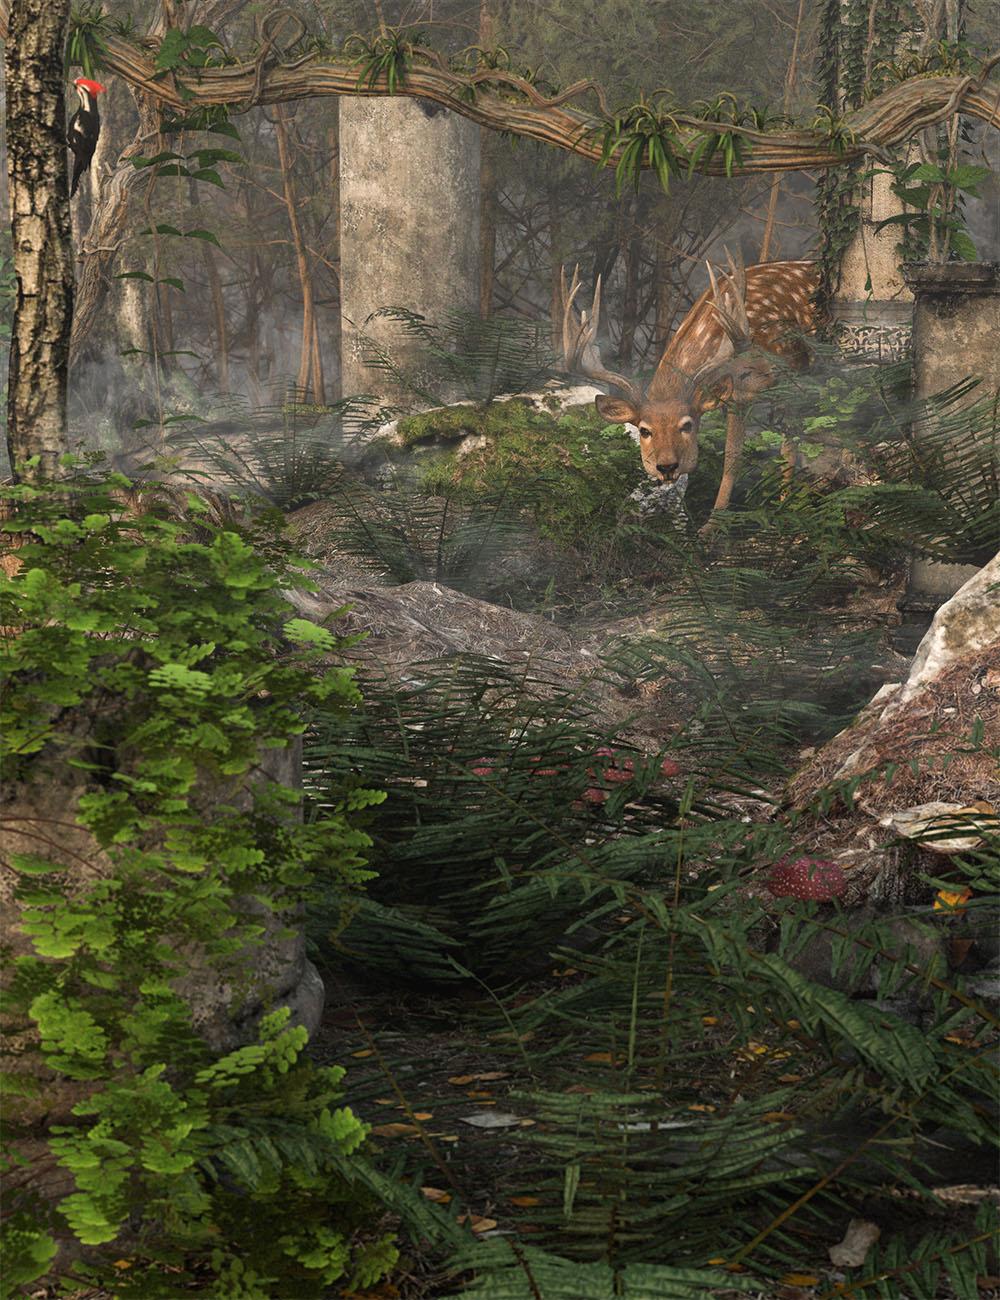 Wild Plants Temperate Ferns Vol 2 by: MartinJFrost, 3D Models by Daz 3D